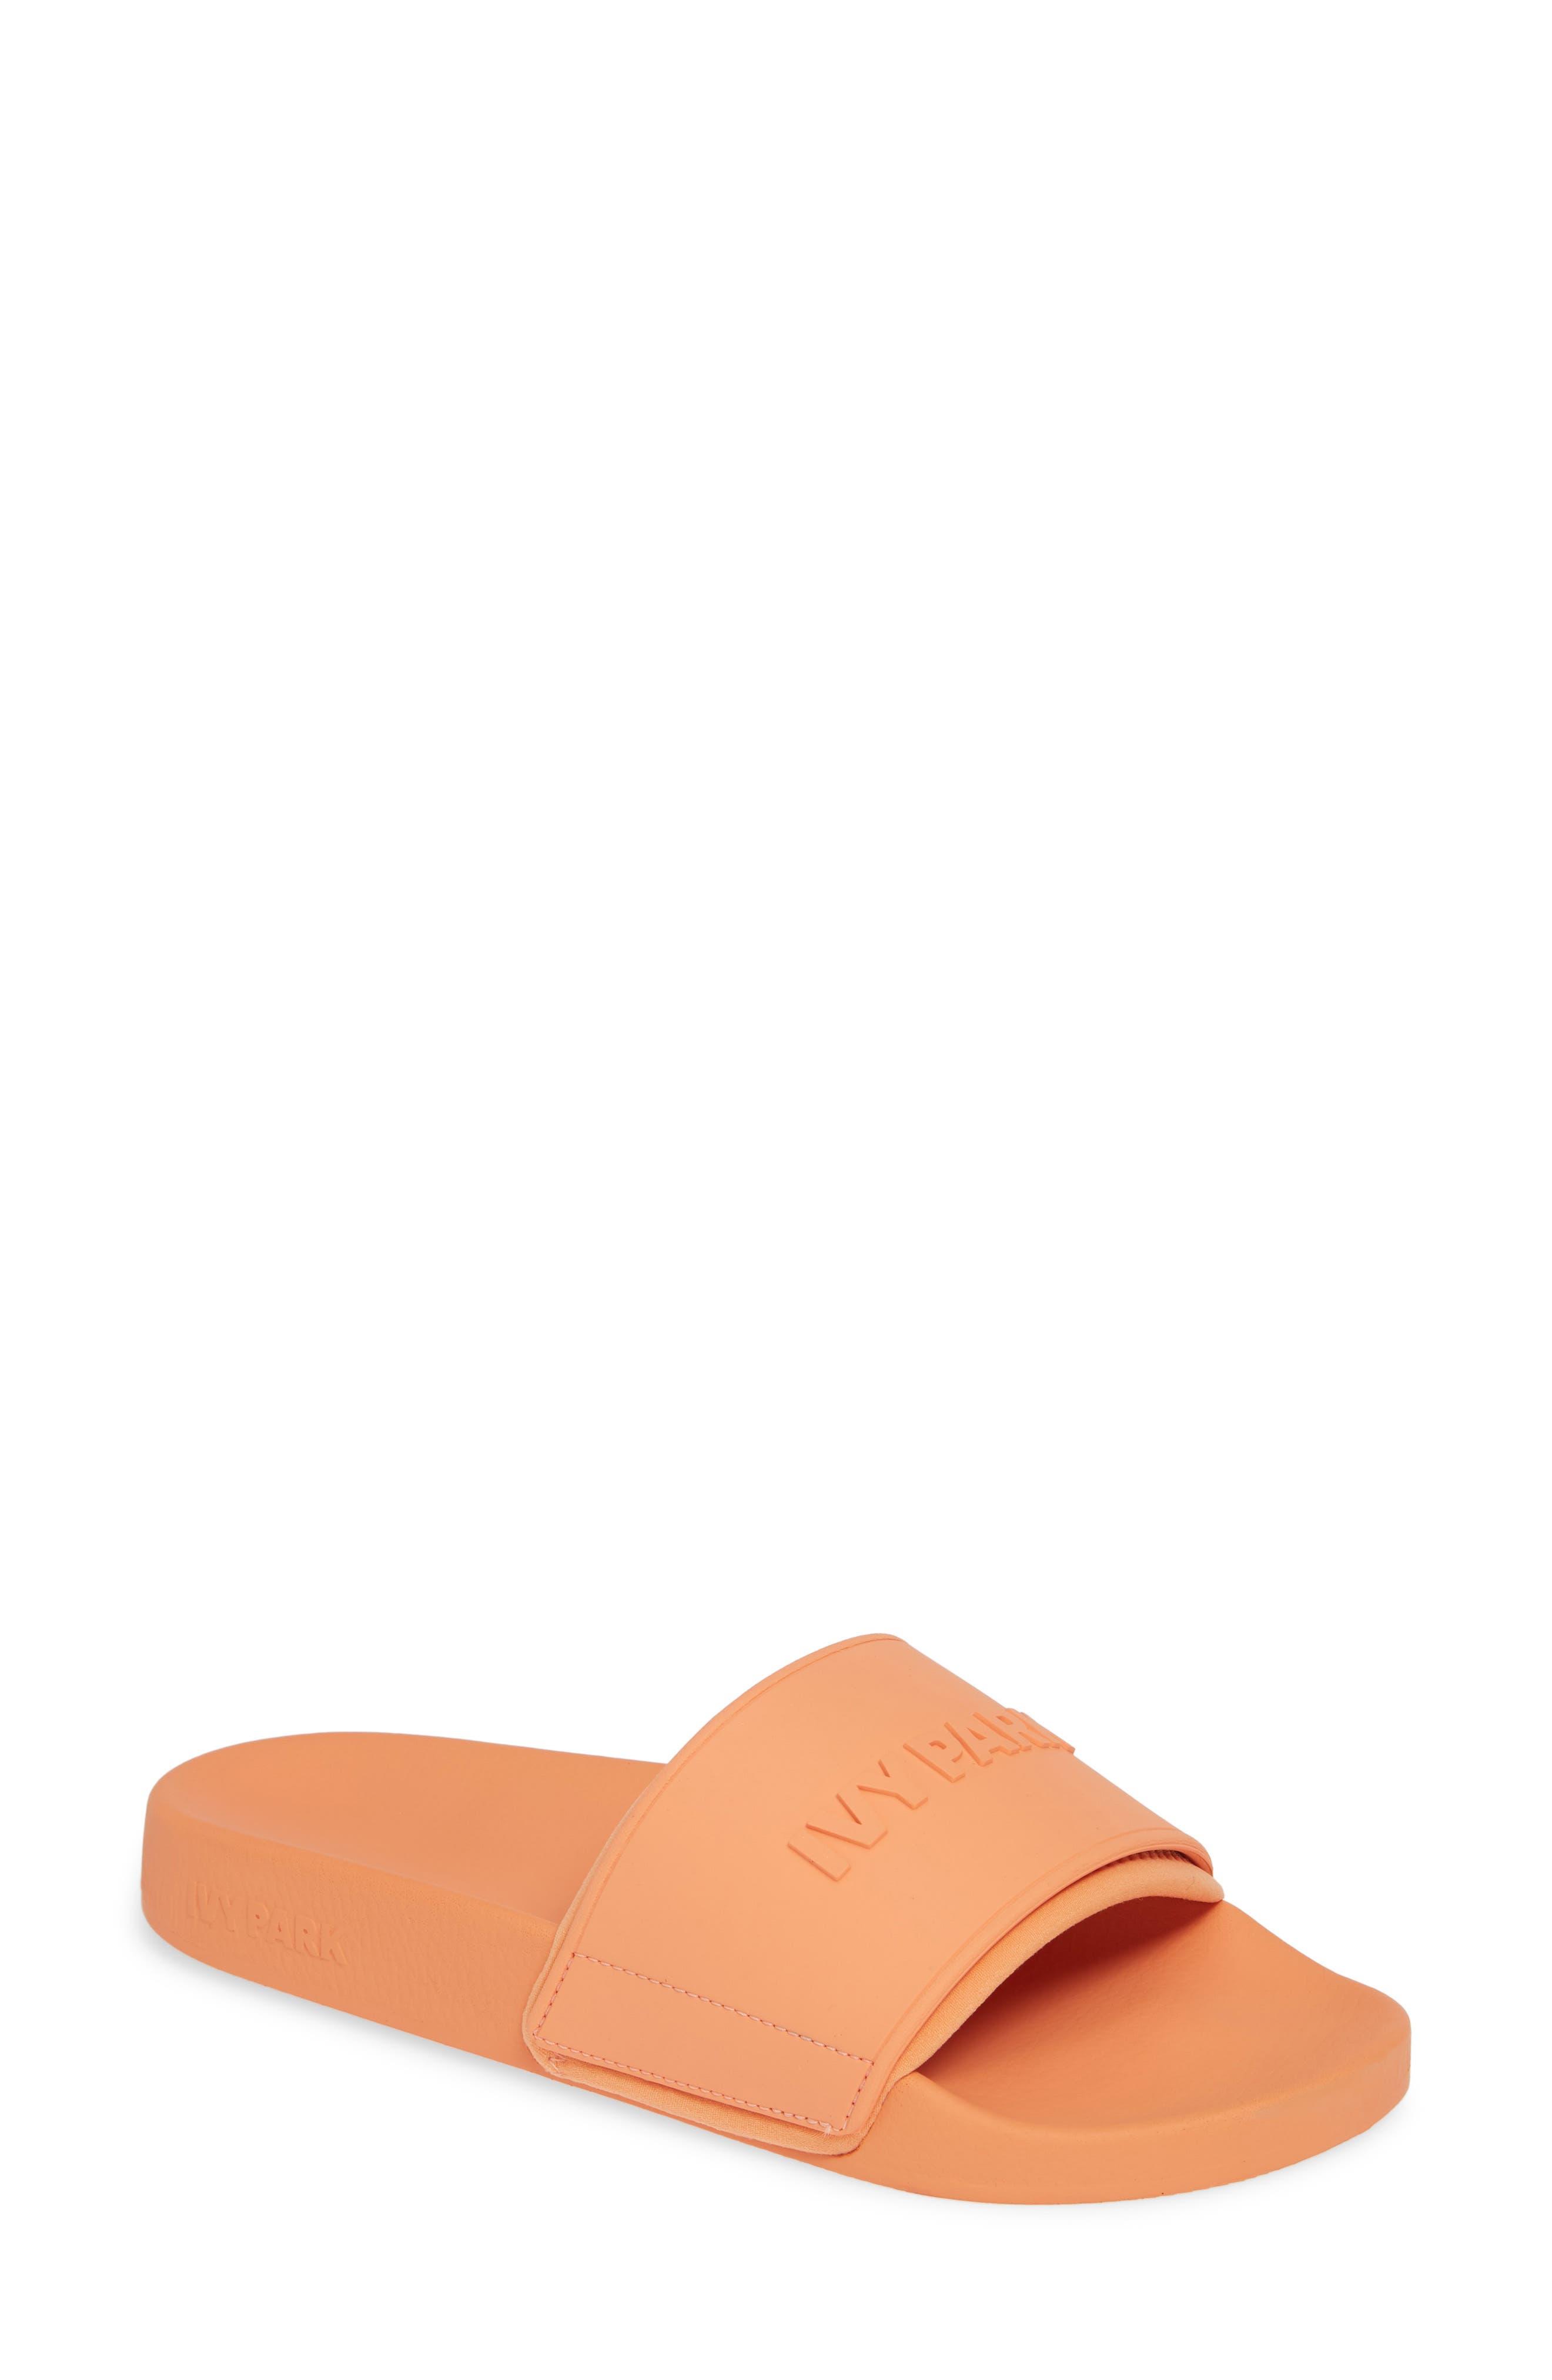 Embossed Logo Slide Sandal by Ivy Park®